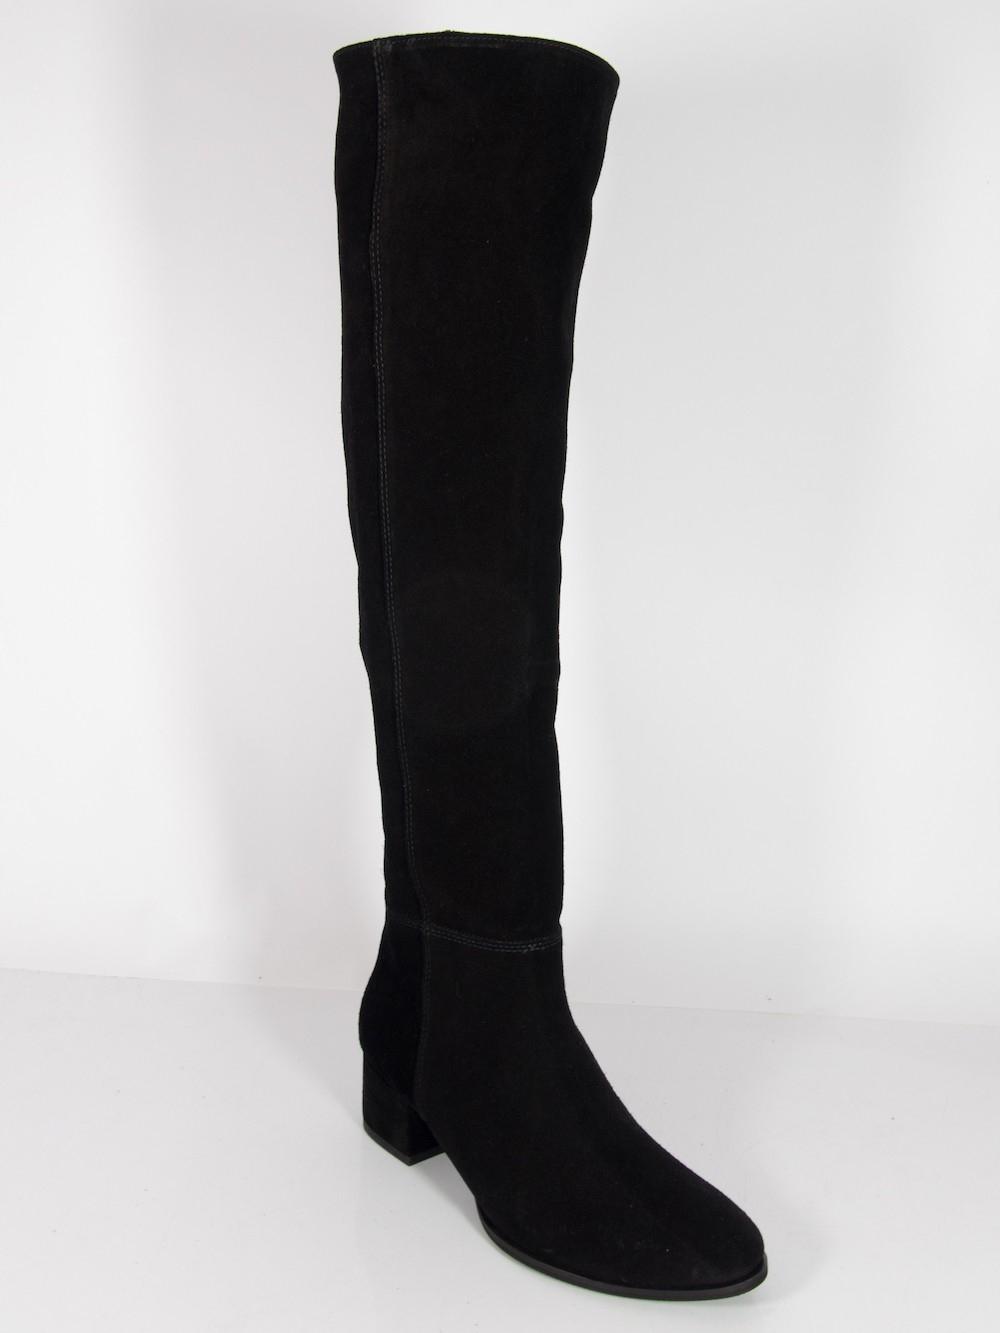 Kozaki Muszkieterki Vanessa 1016 Czarny Welur 40 6997840374 Oficjalne Archiwum Allegro Boots Fashion Wishlist Knee Boots